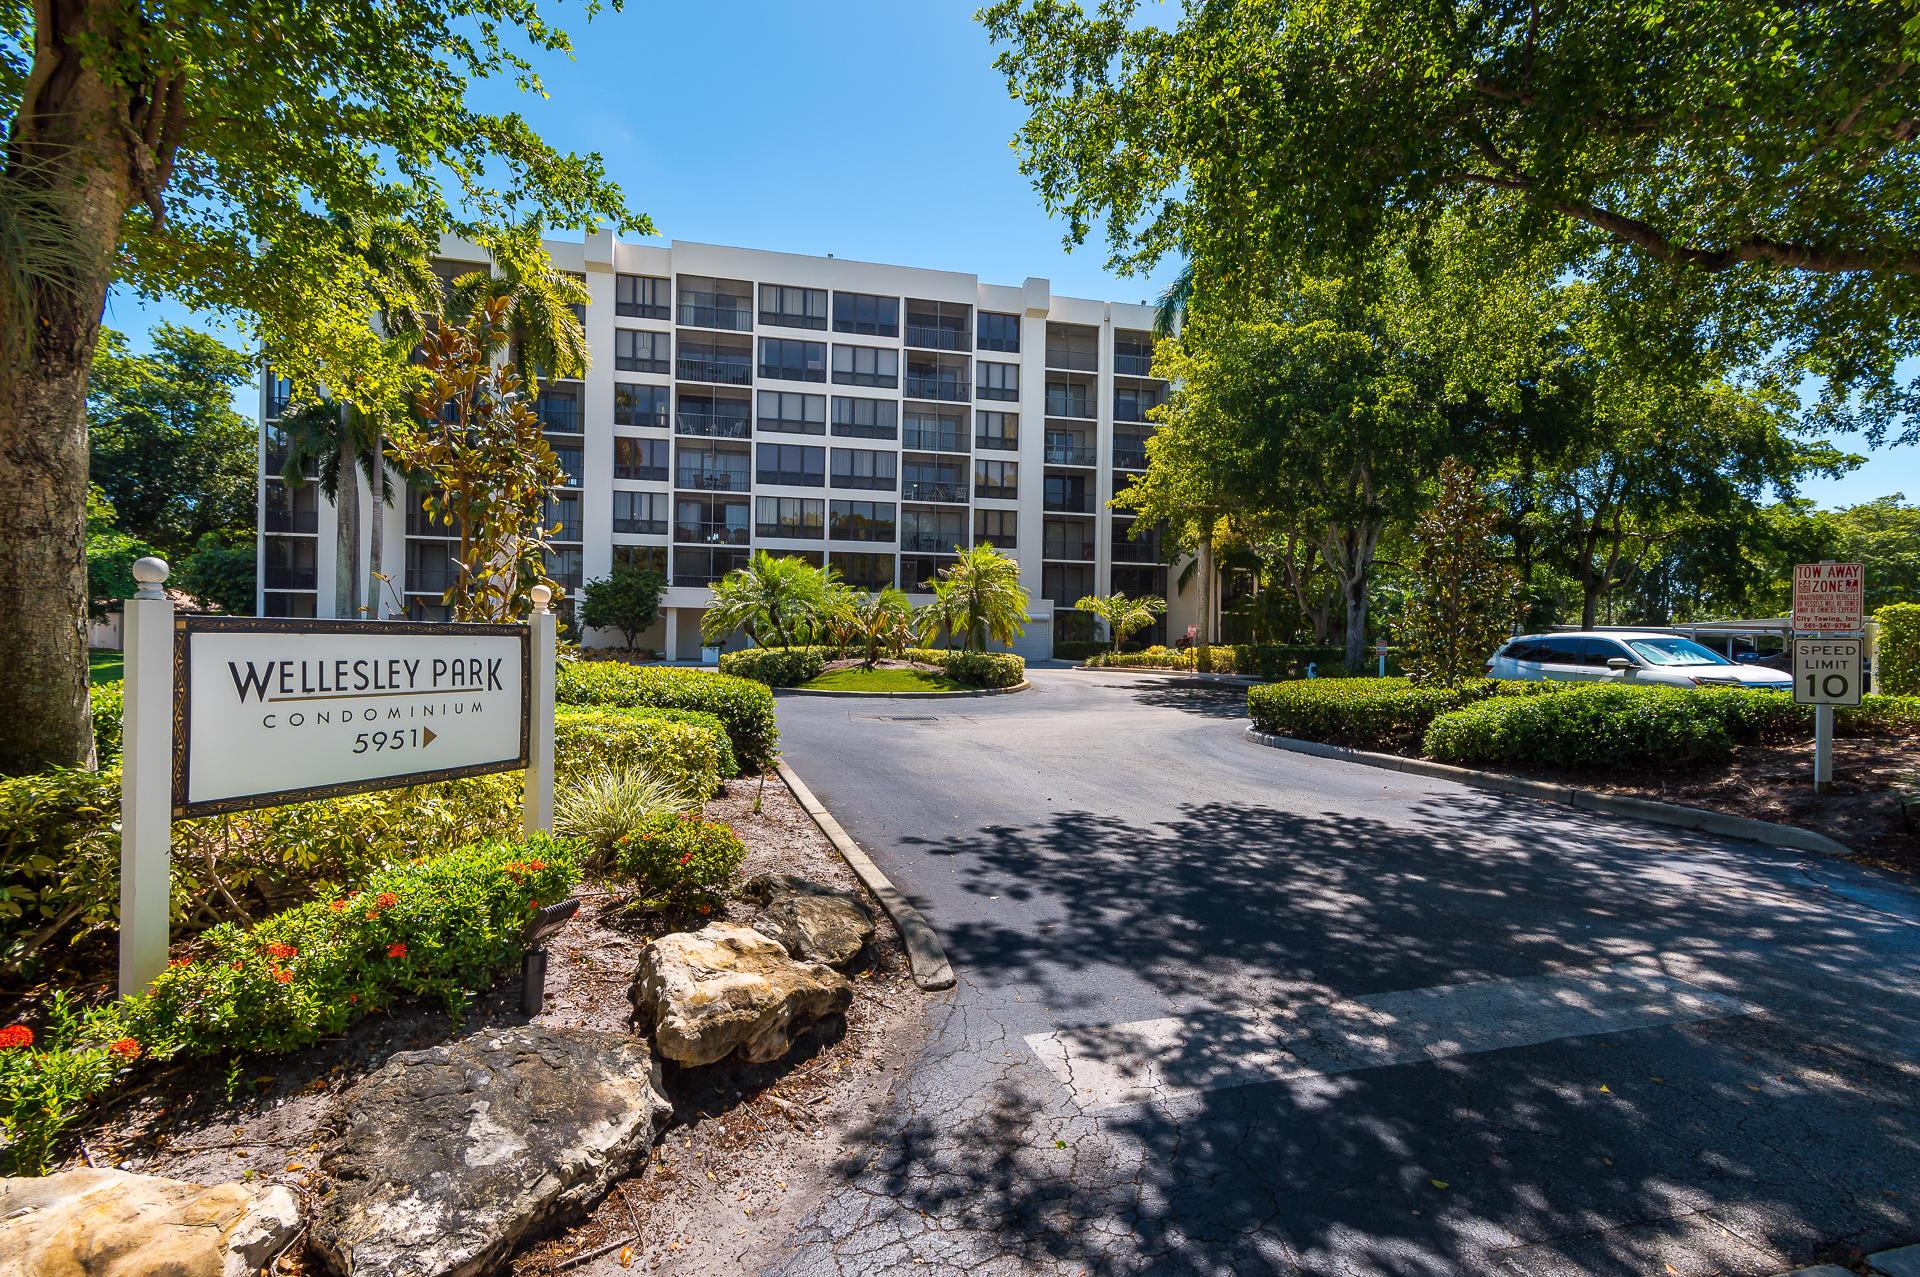 5951 Wellesley Park Drive #205 Boca Raton, FL 33433